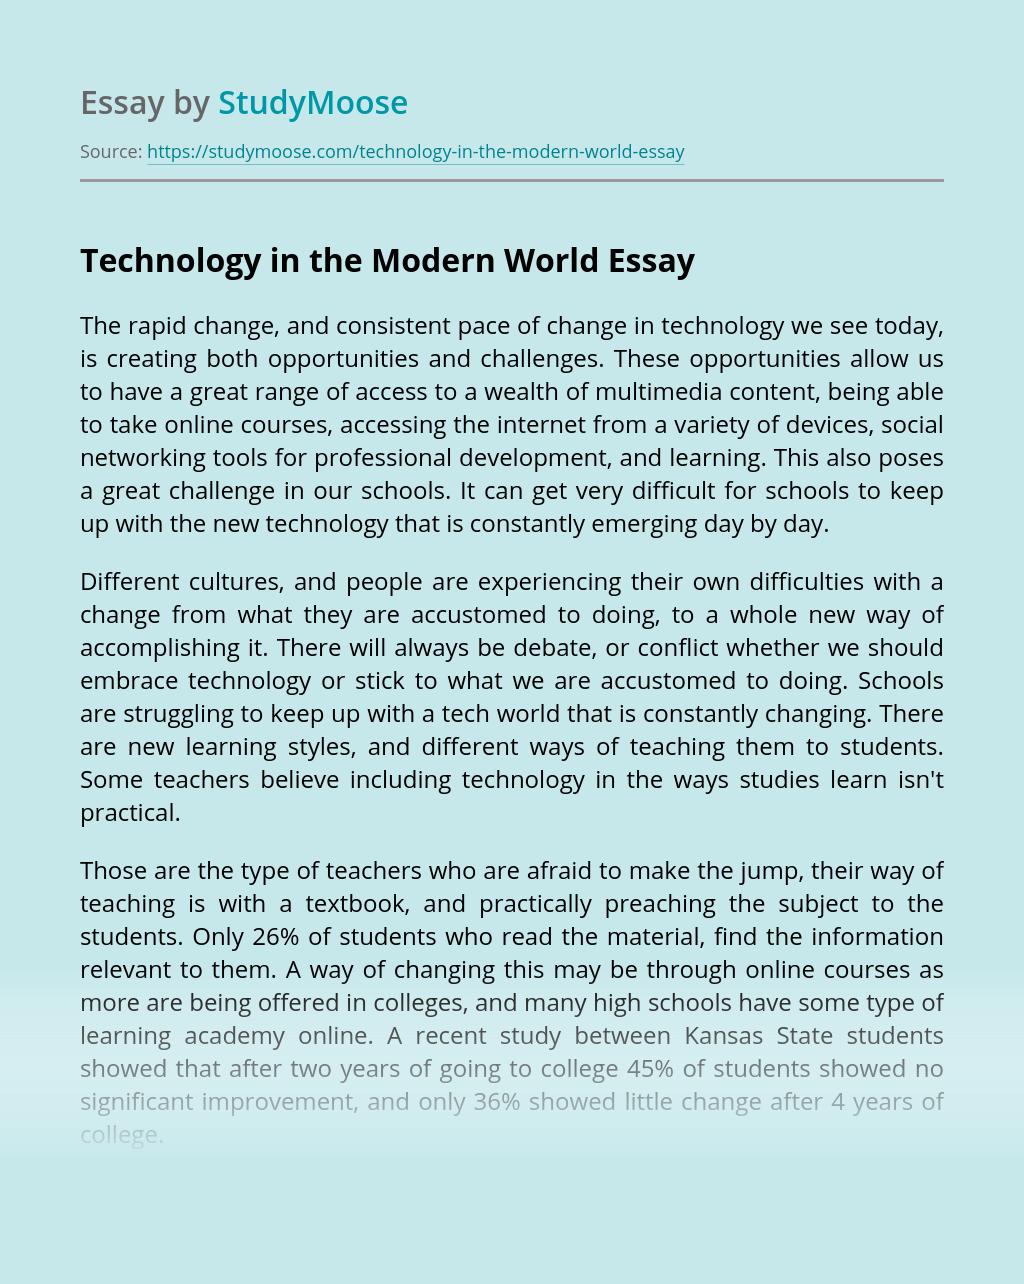 Technology in the Modern World